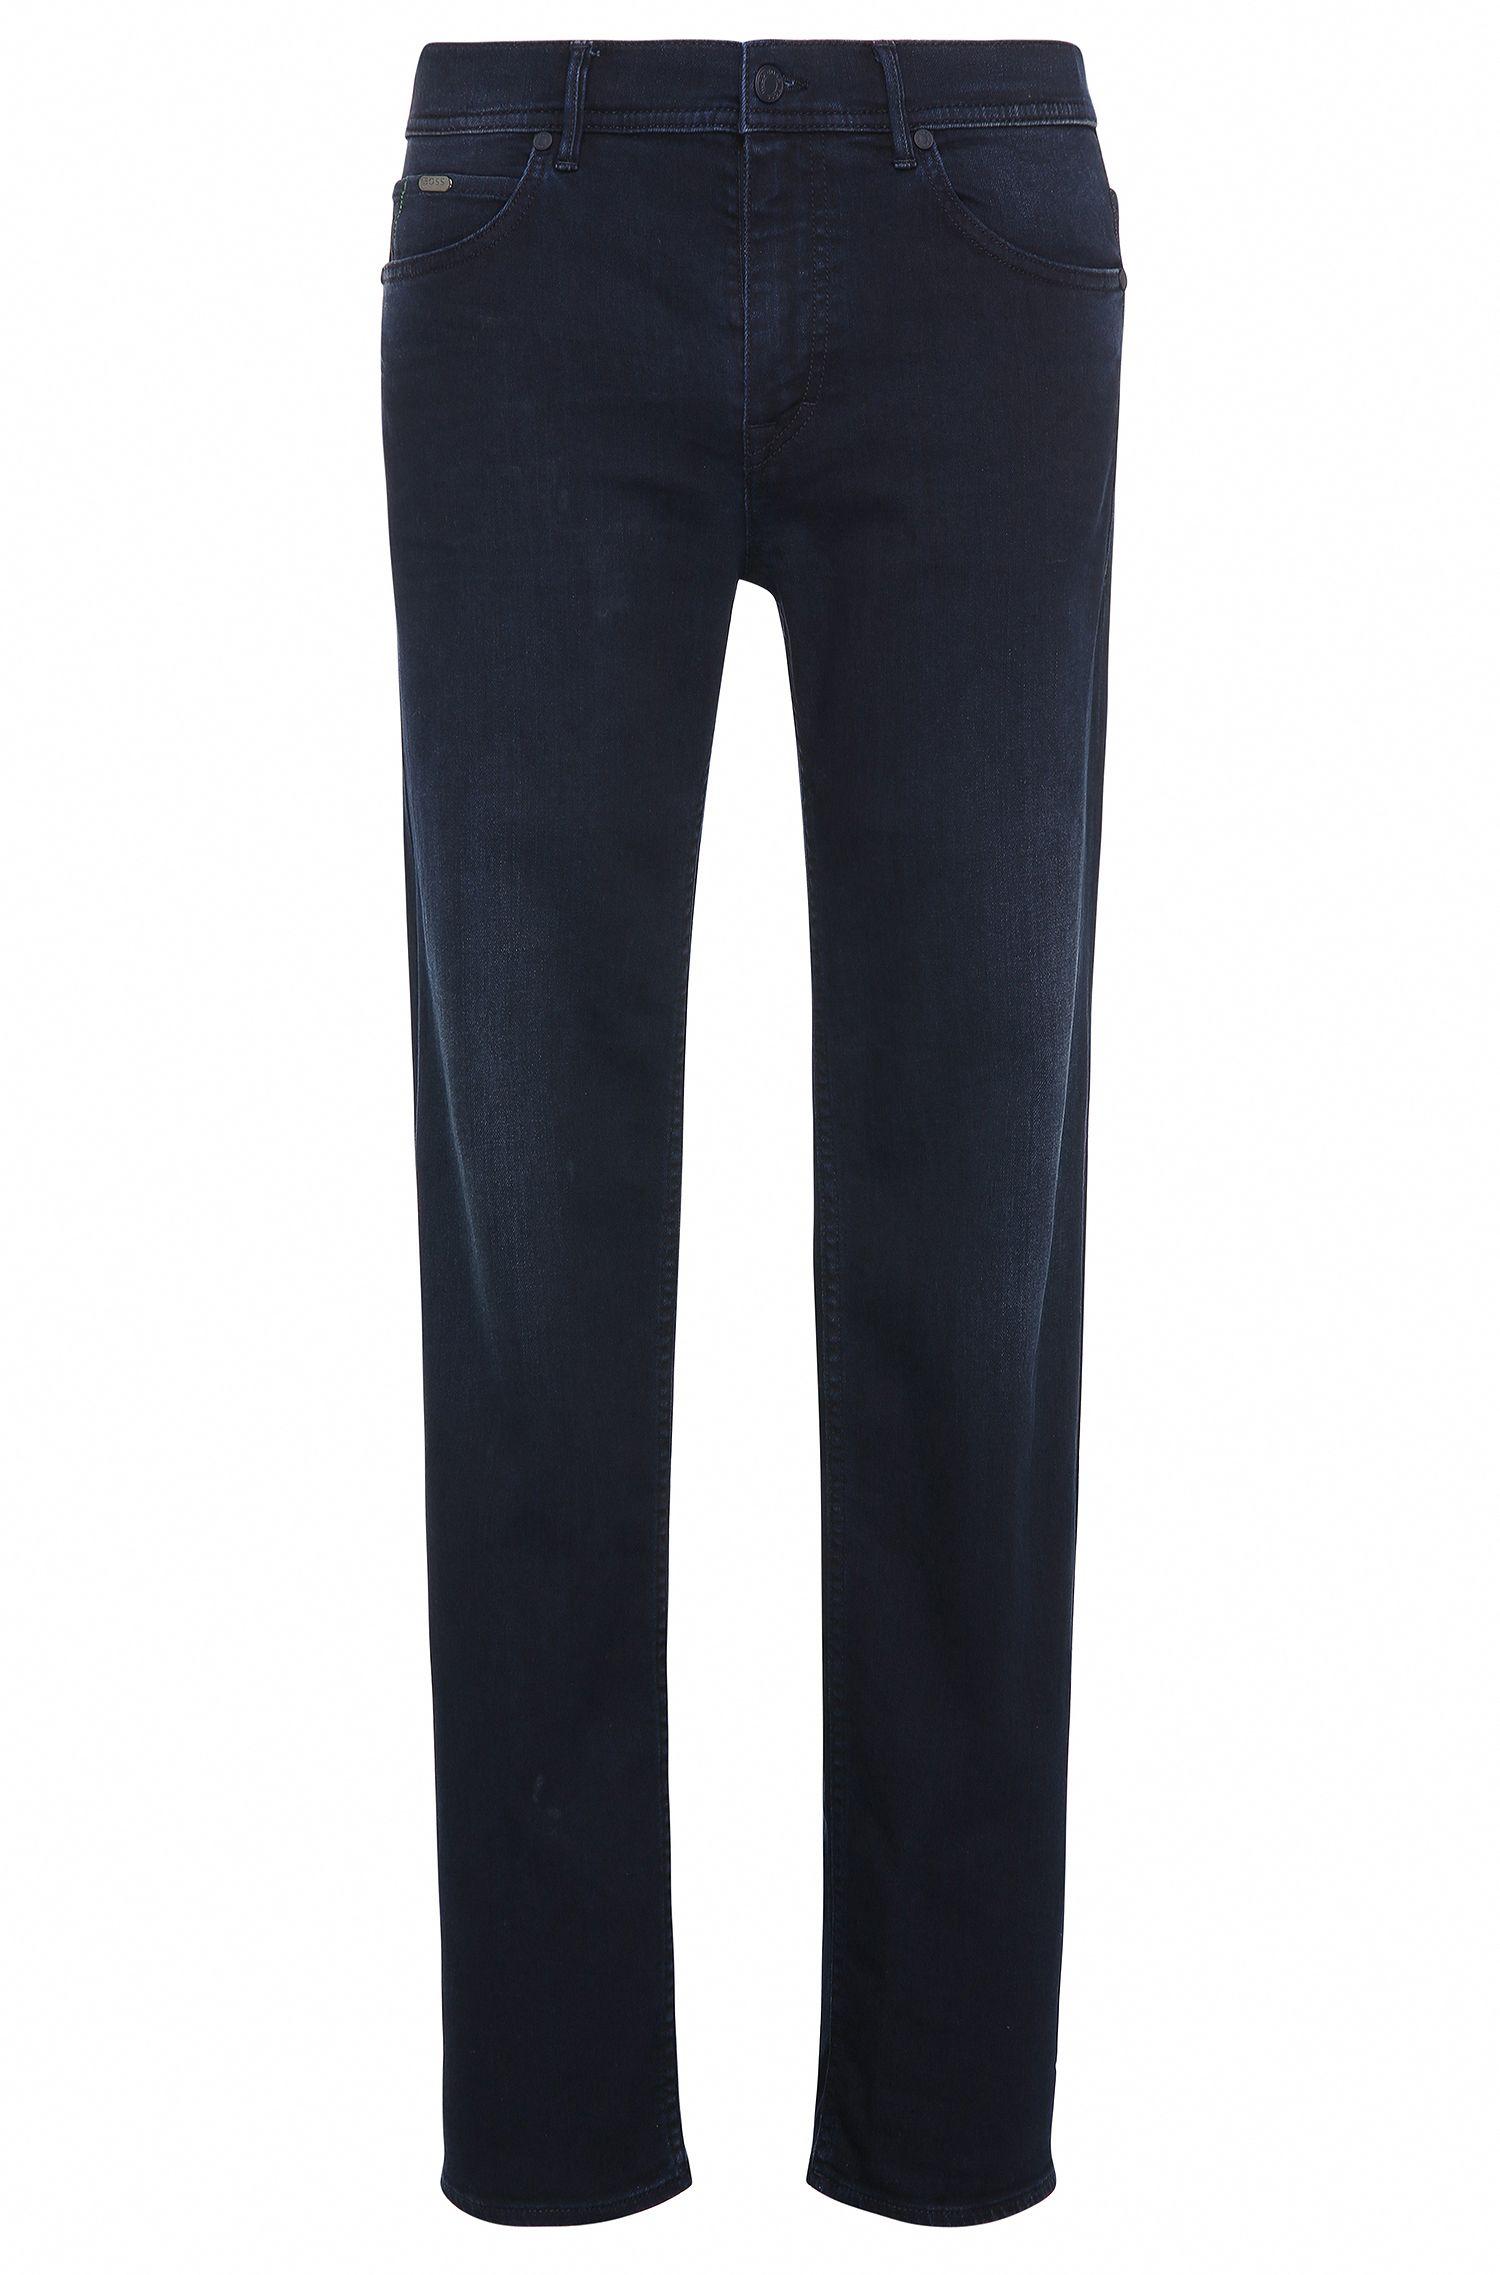 'Deam' | Regular Fit, 10 oz Stretch Cotton Blend Jeans